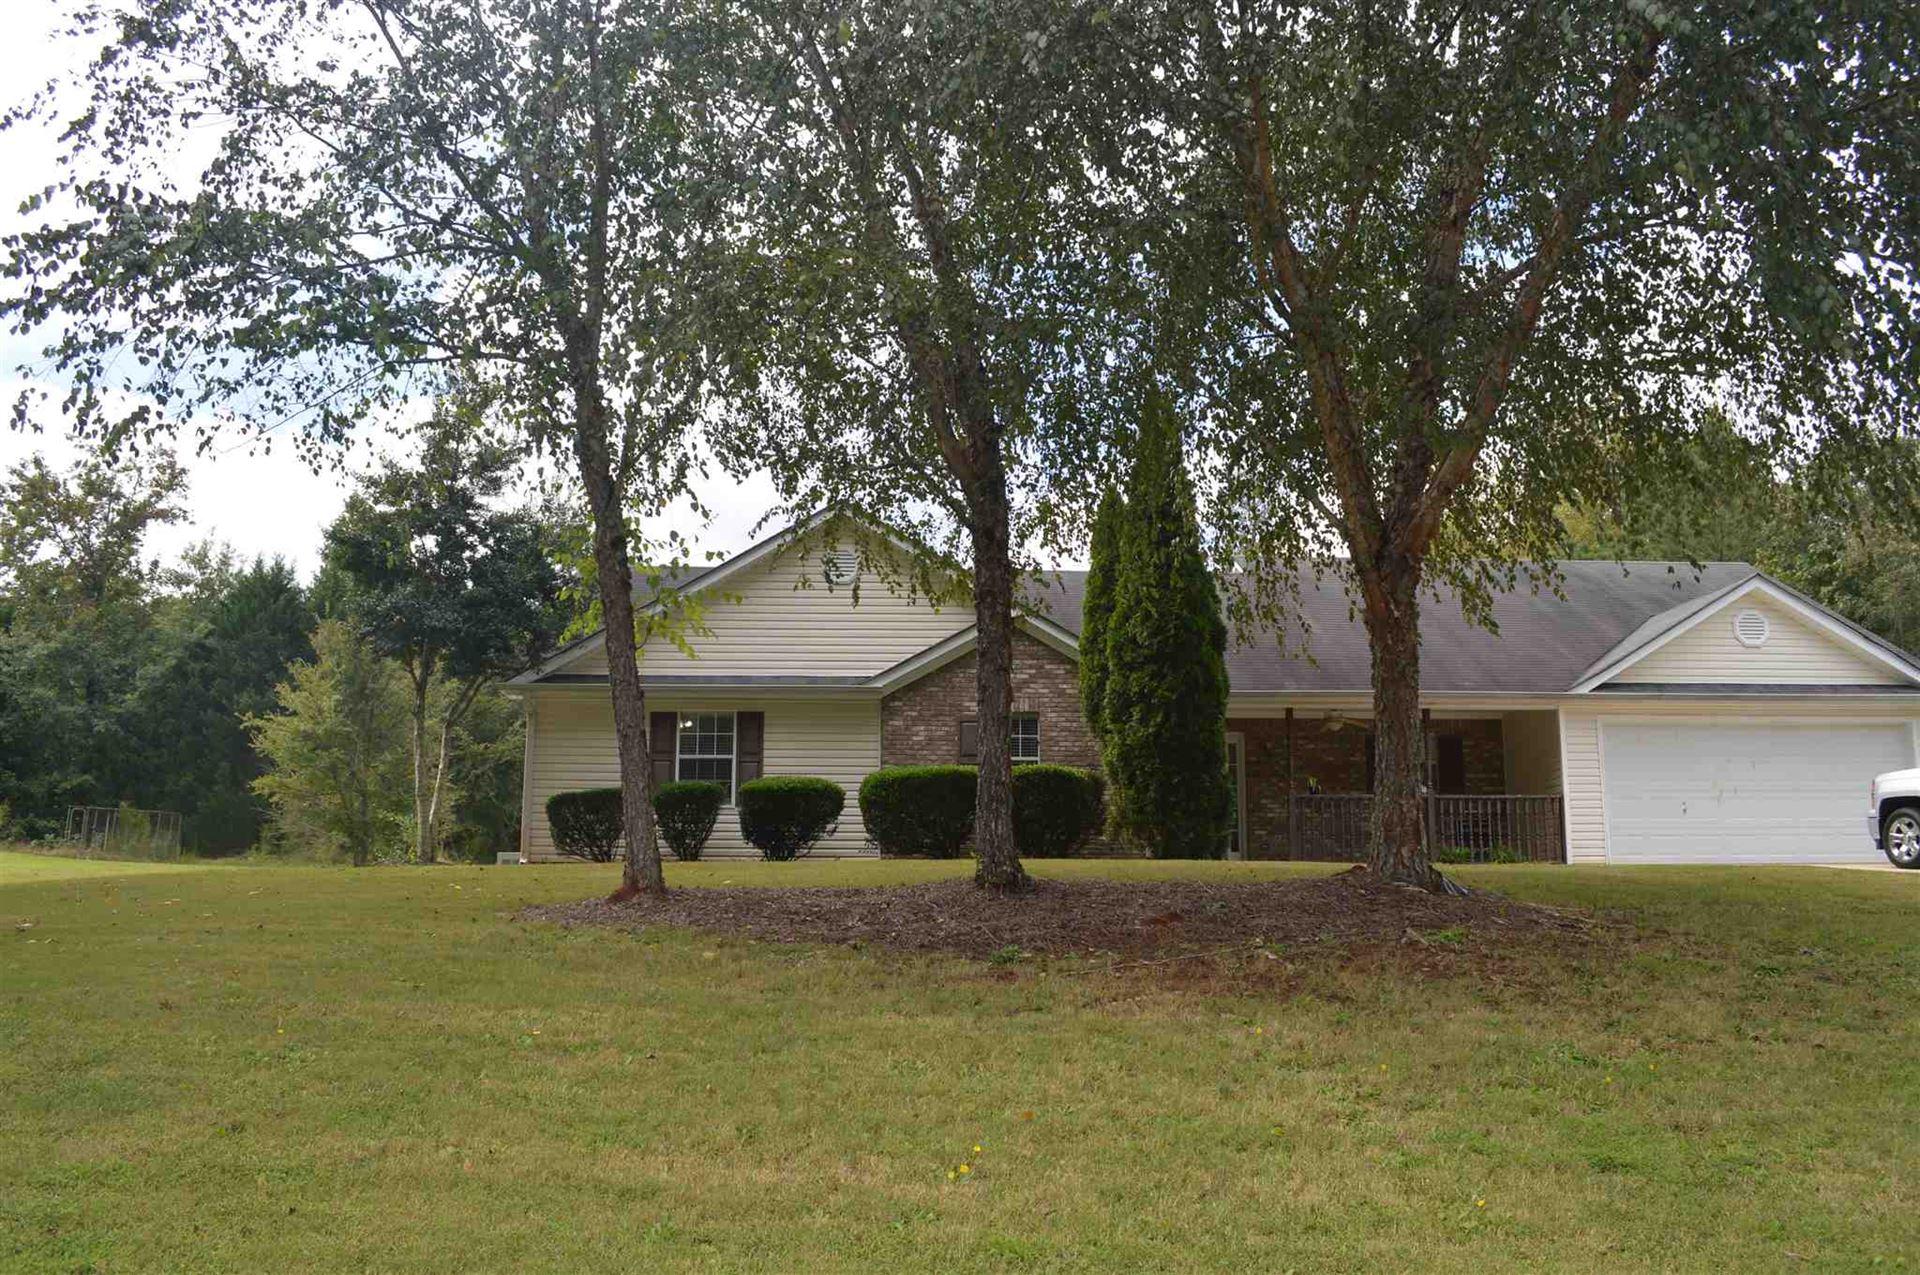 25 Parkwood Dr, Covington, GA 30016 - #: 8863420